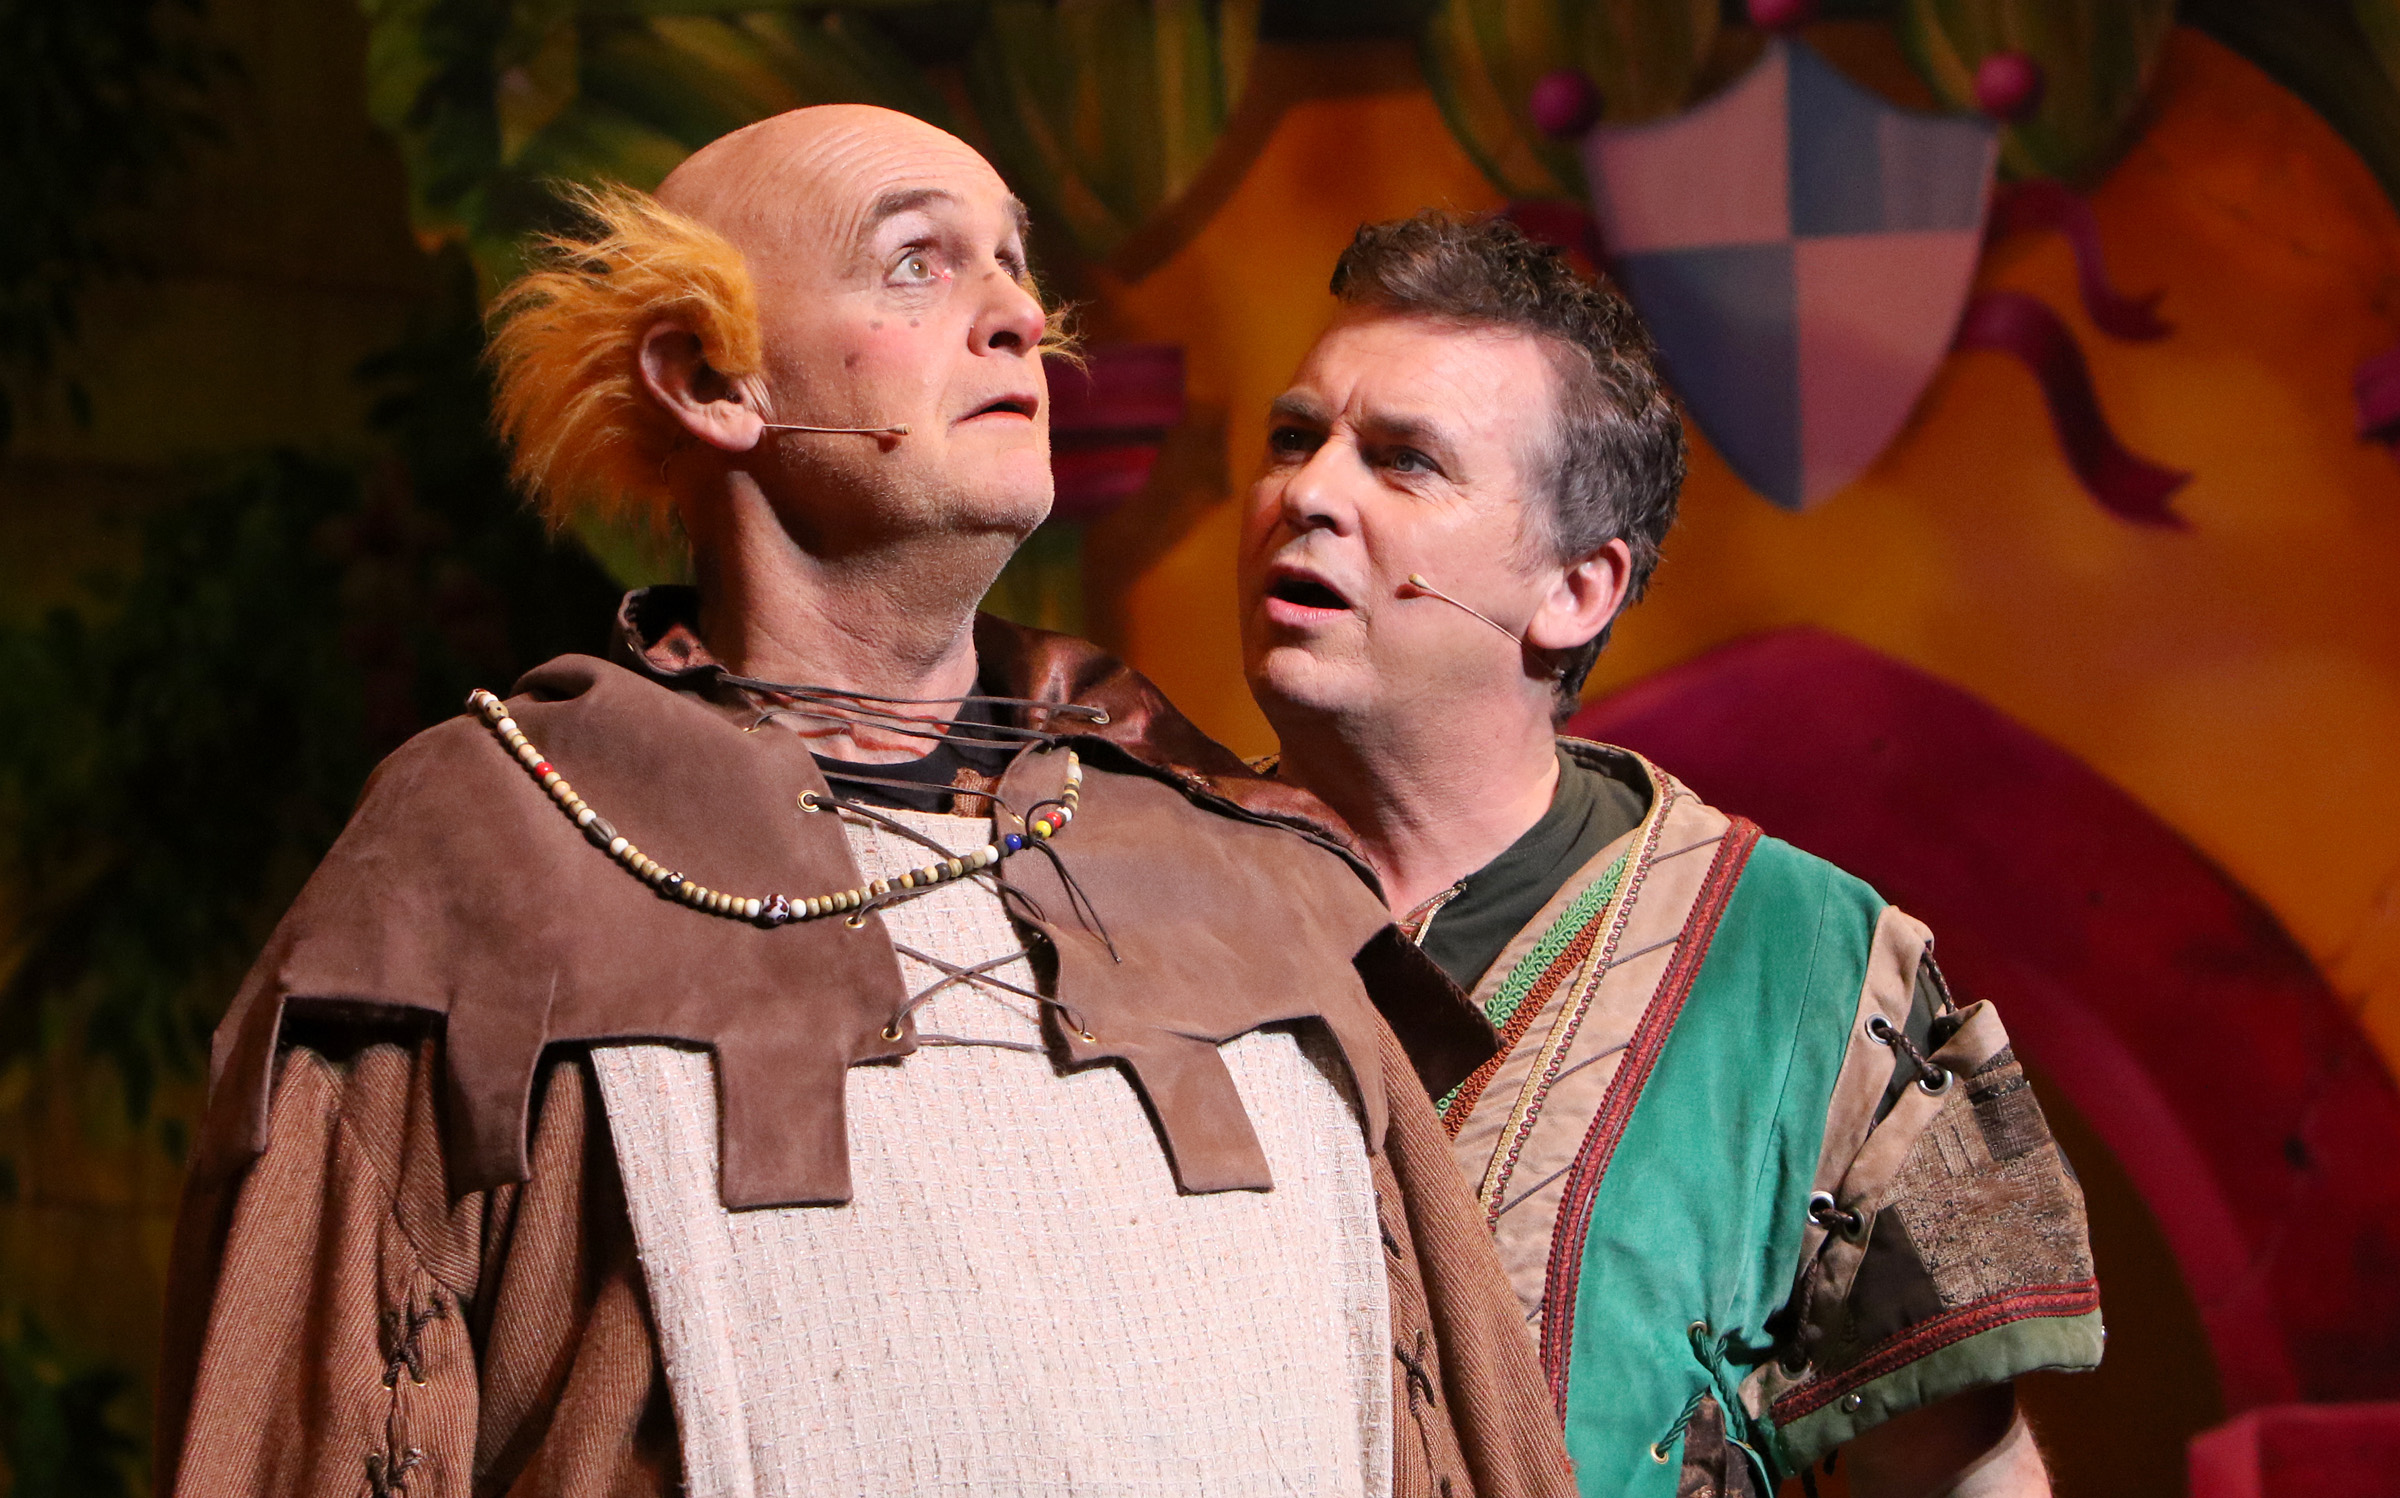 Robin Hood pantomime at Milton Keynes Theatre, Christmas 2018